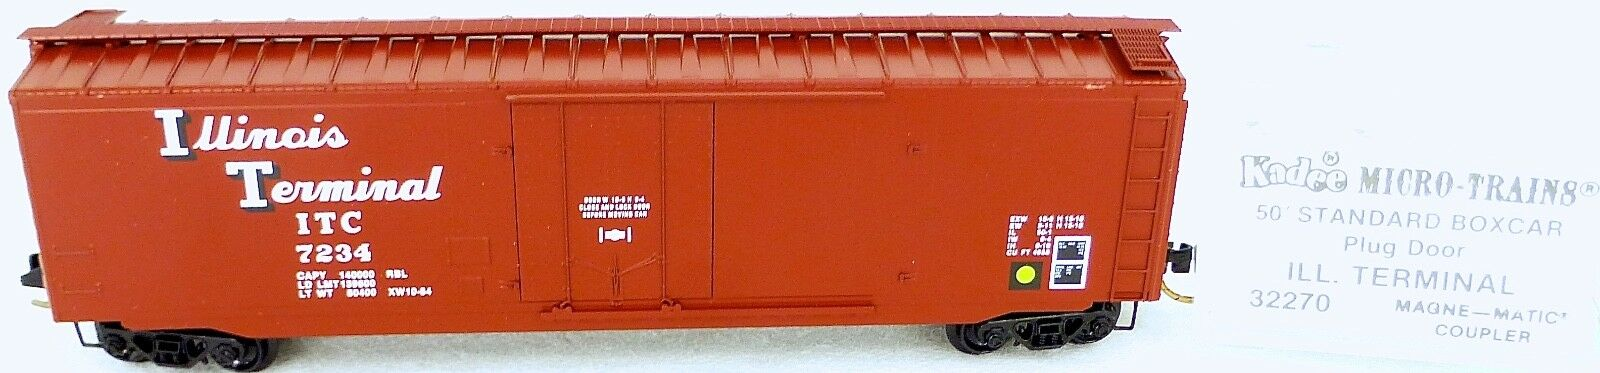 50' standard boxcar ill terminal 7234 micro trains line 32270 n 1 160 C å